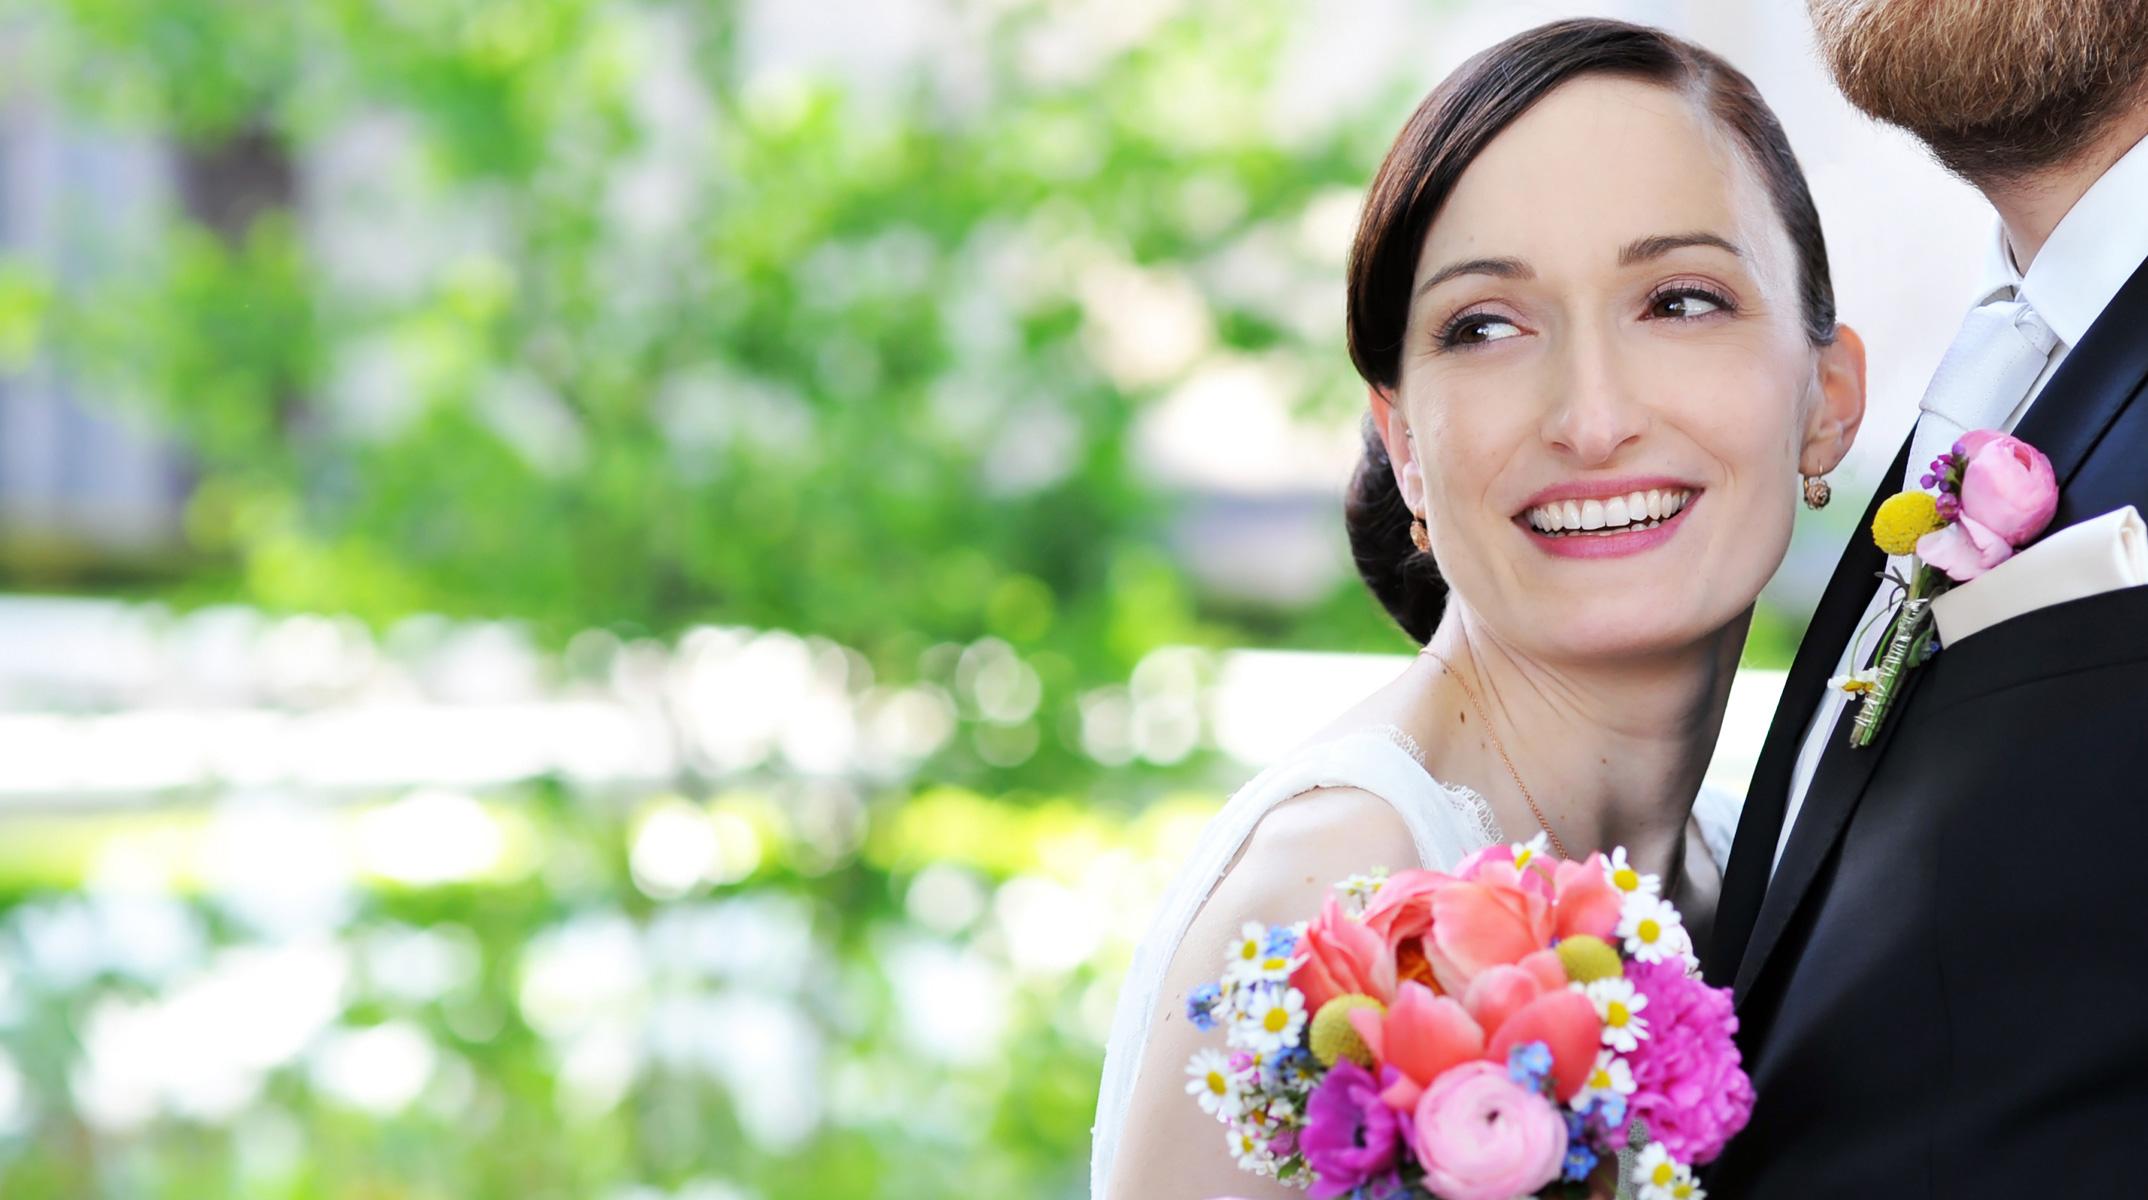 Hochzeitsfotografie-Nicole-Bouillon_Nicole-Bouillon-Fotografie30